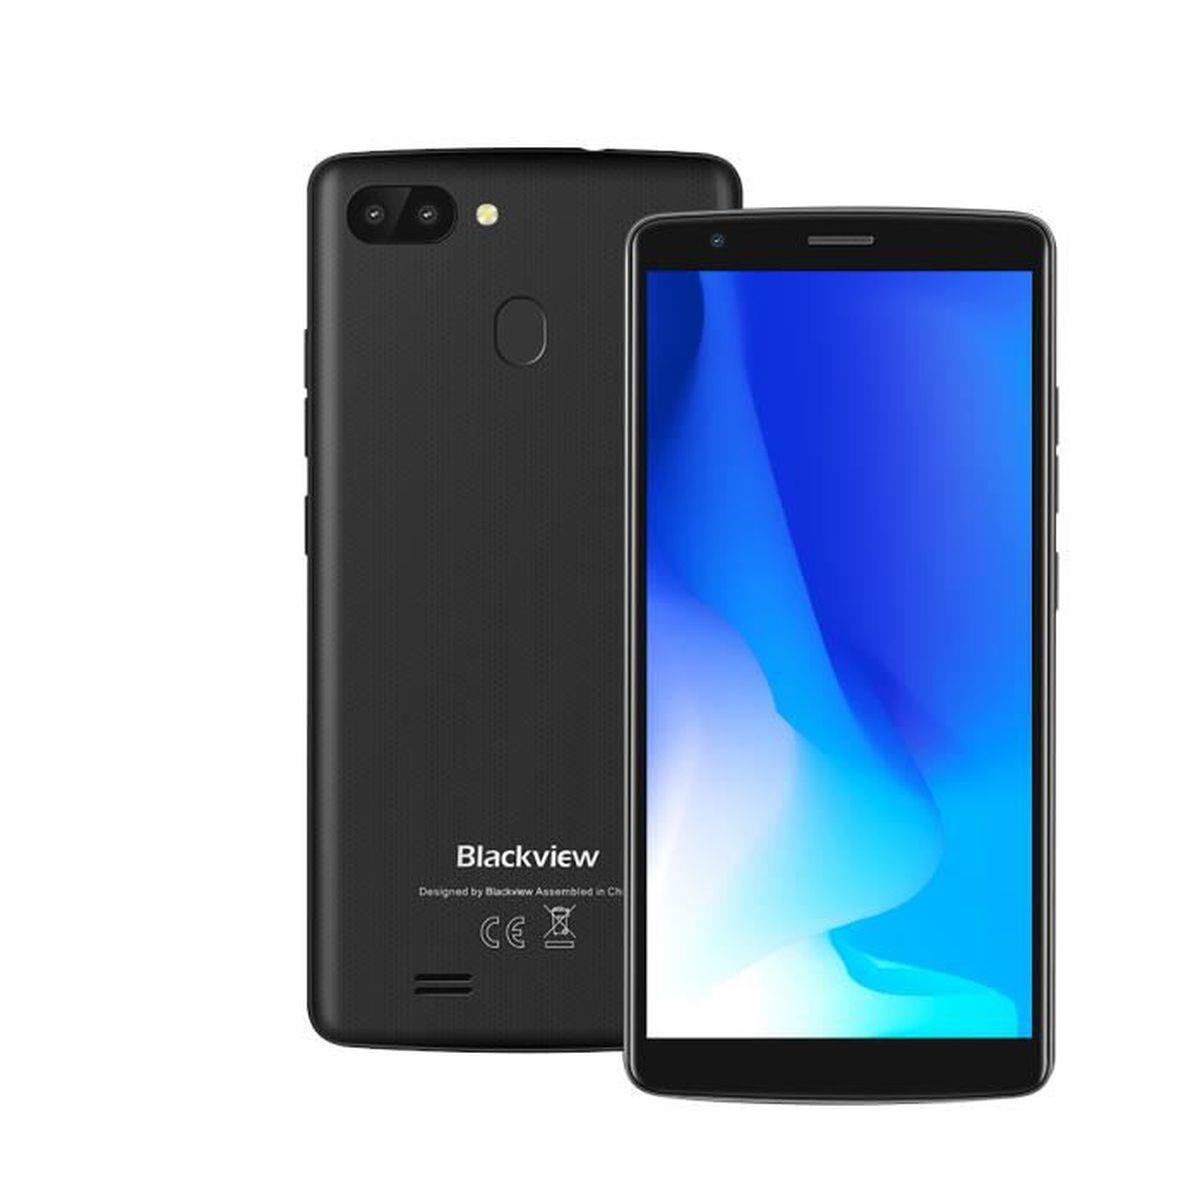 SMARTPHONE Blackview A20 Pro Gris  EU